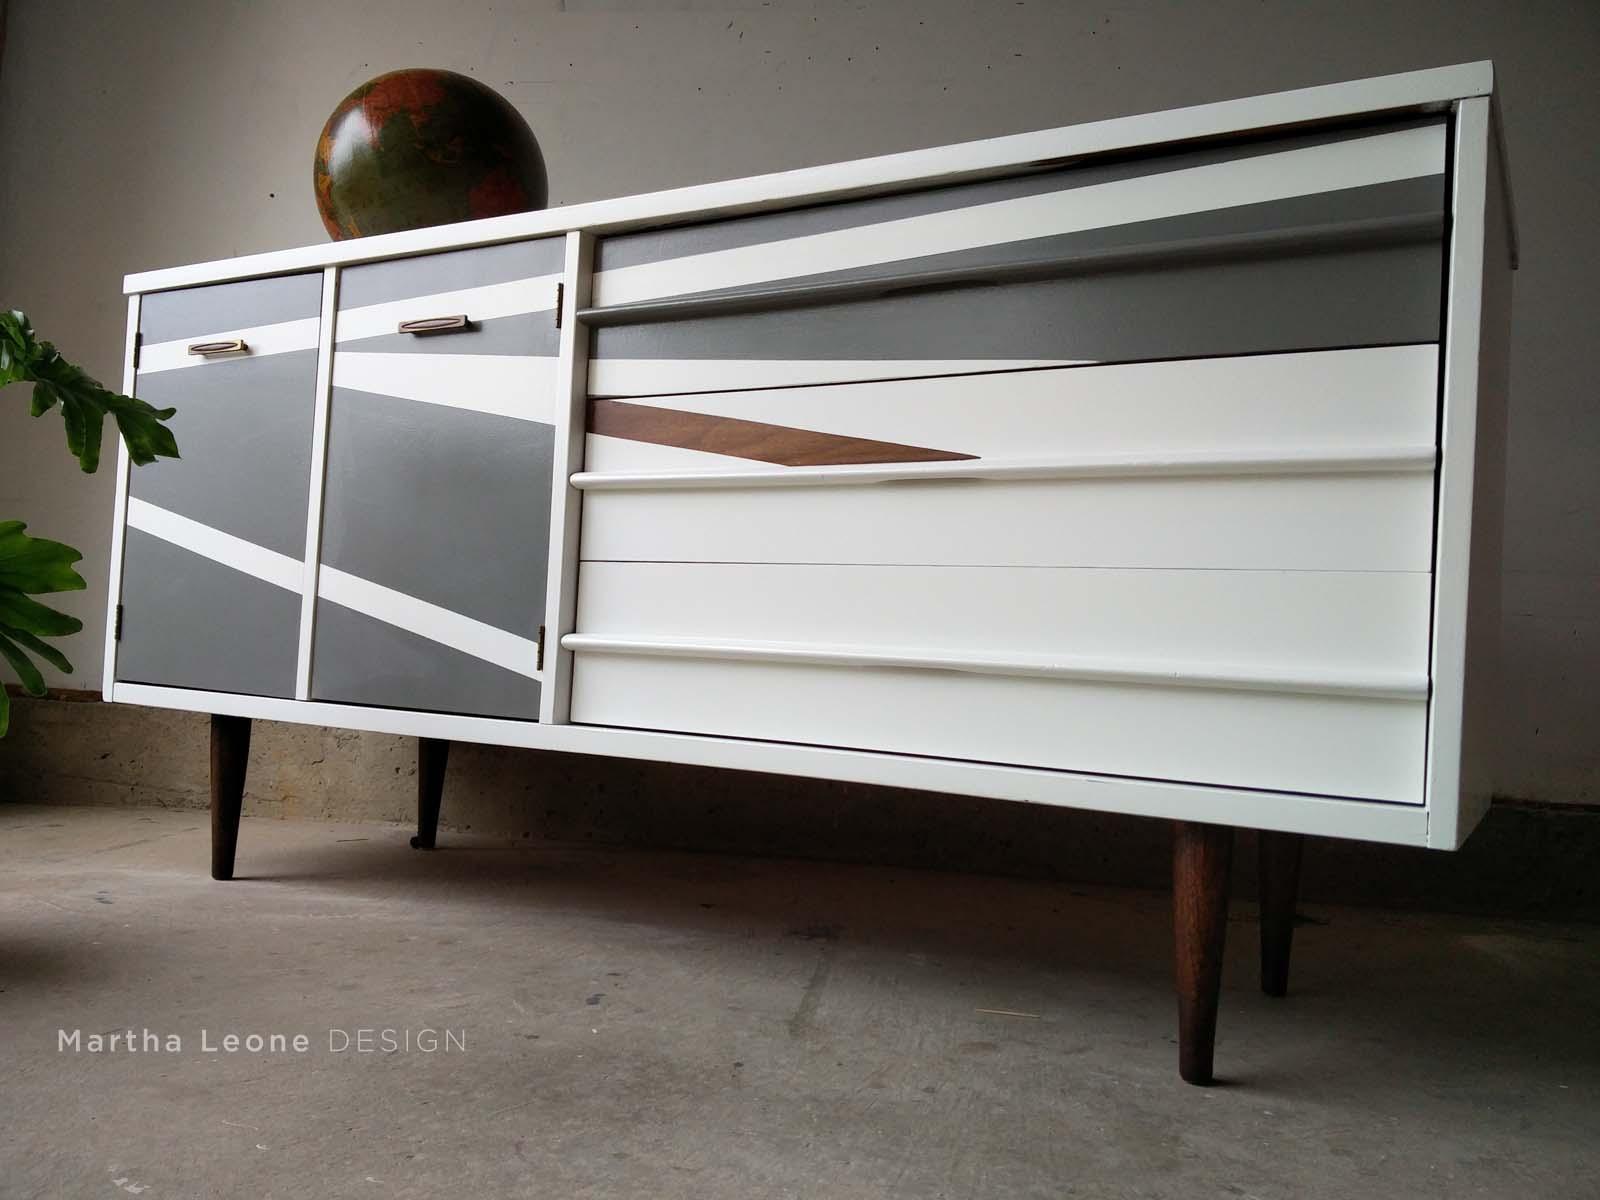 Dresser Mid Century6 by Martha Leone Design.jpg